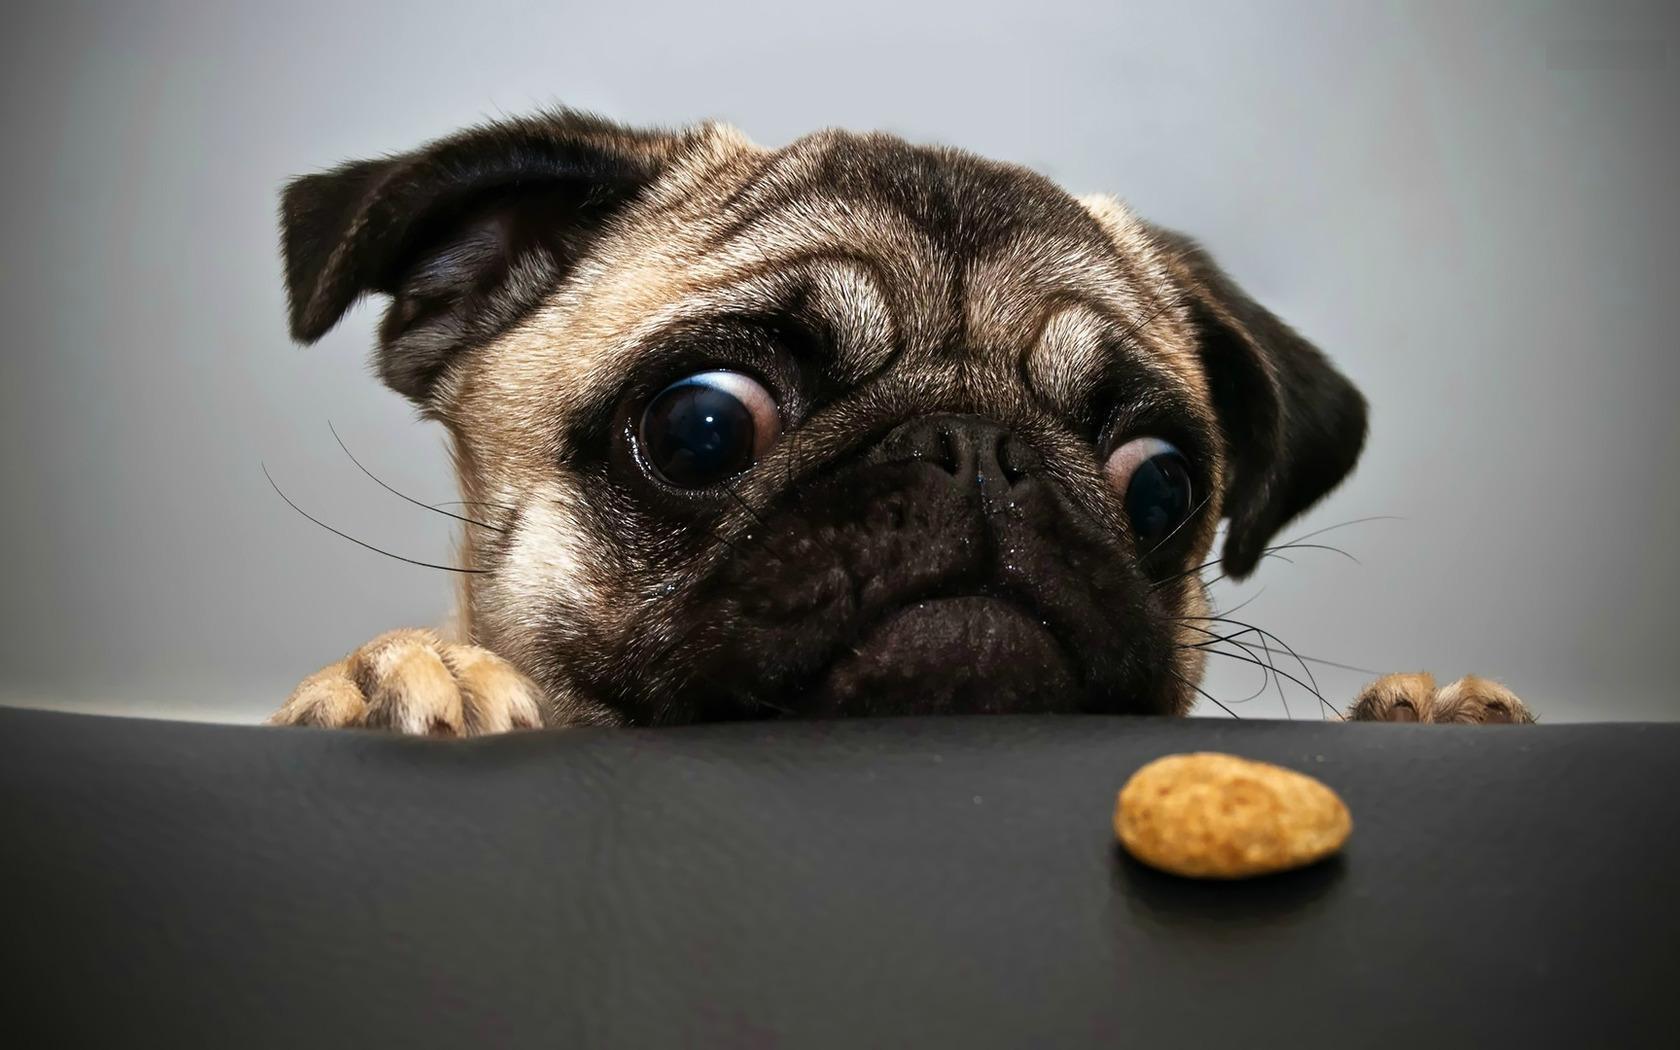 Download pug dog hd desktop wallpapers new beautiful images of pug 1680x1050